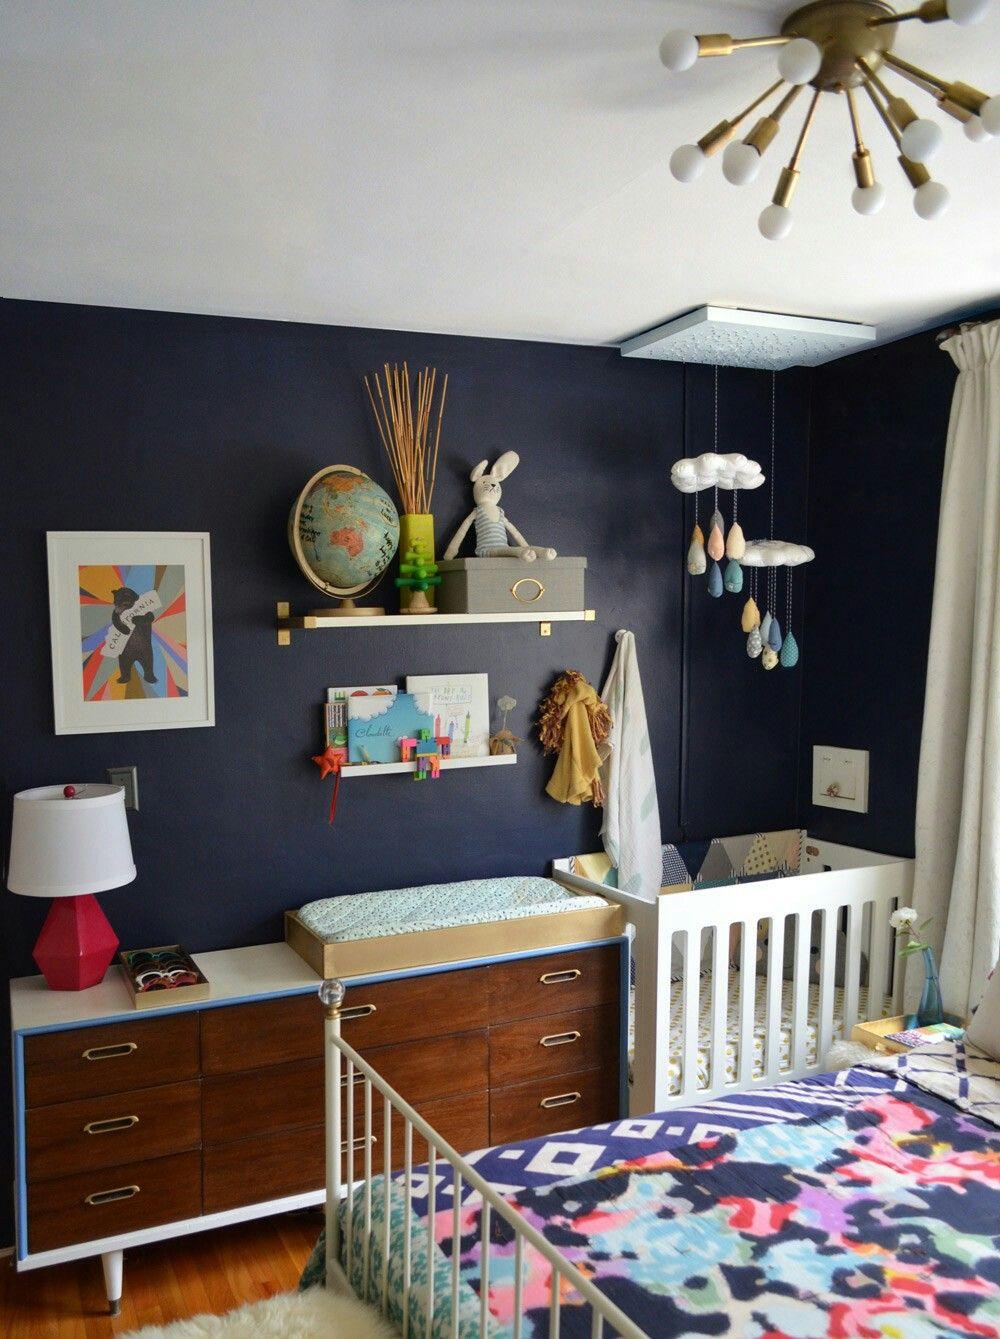 Nursery in master bedroom | Baby | Pinterest | Master bedroom ...